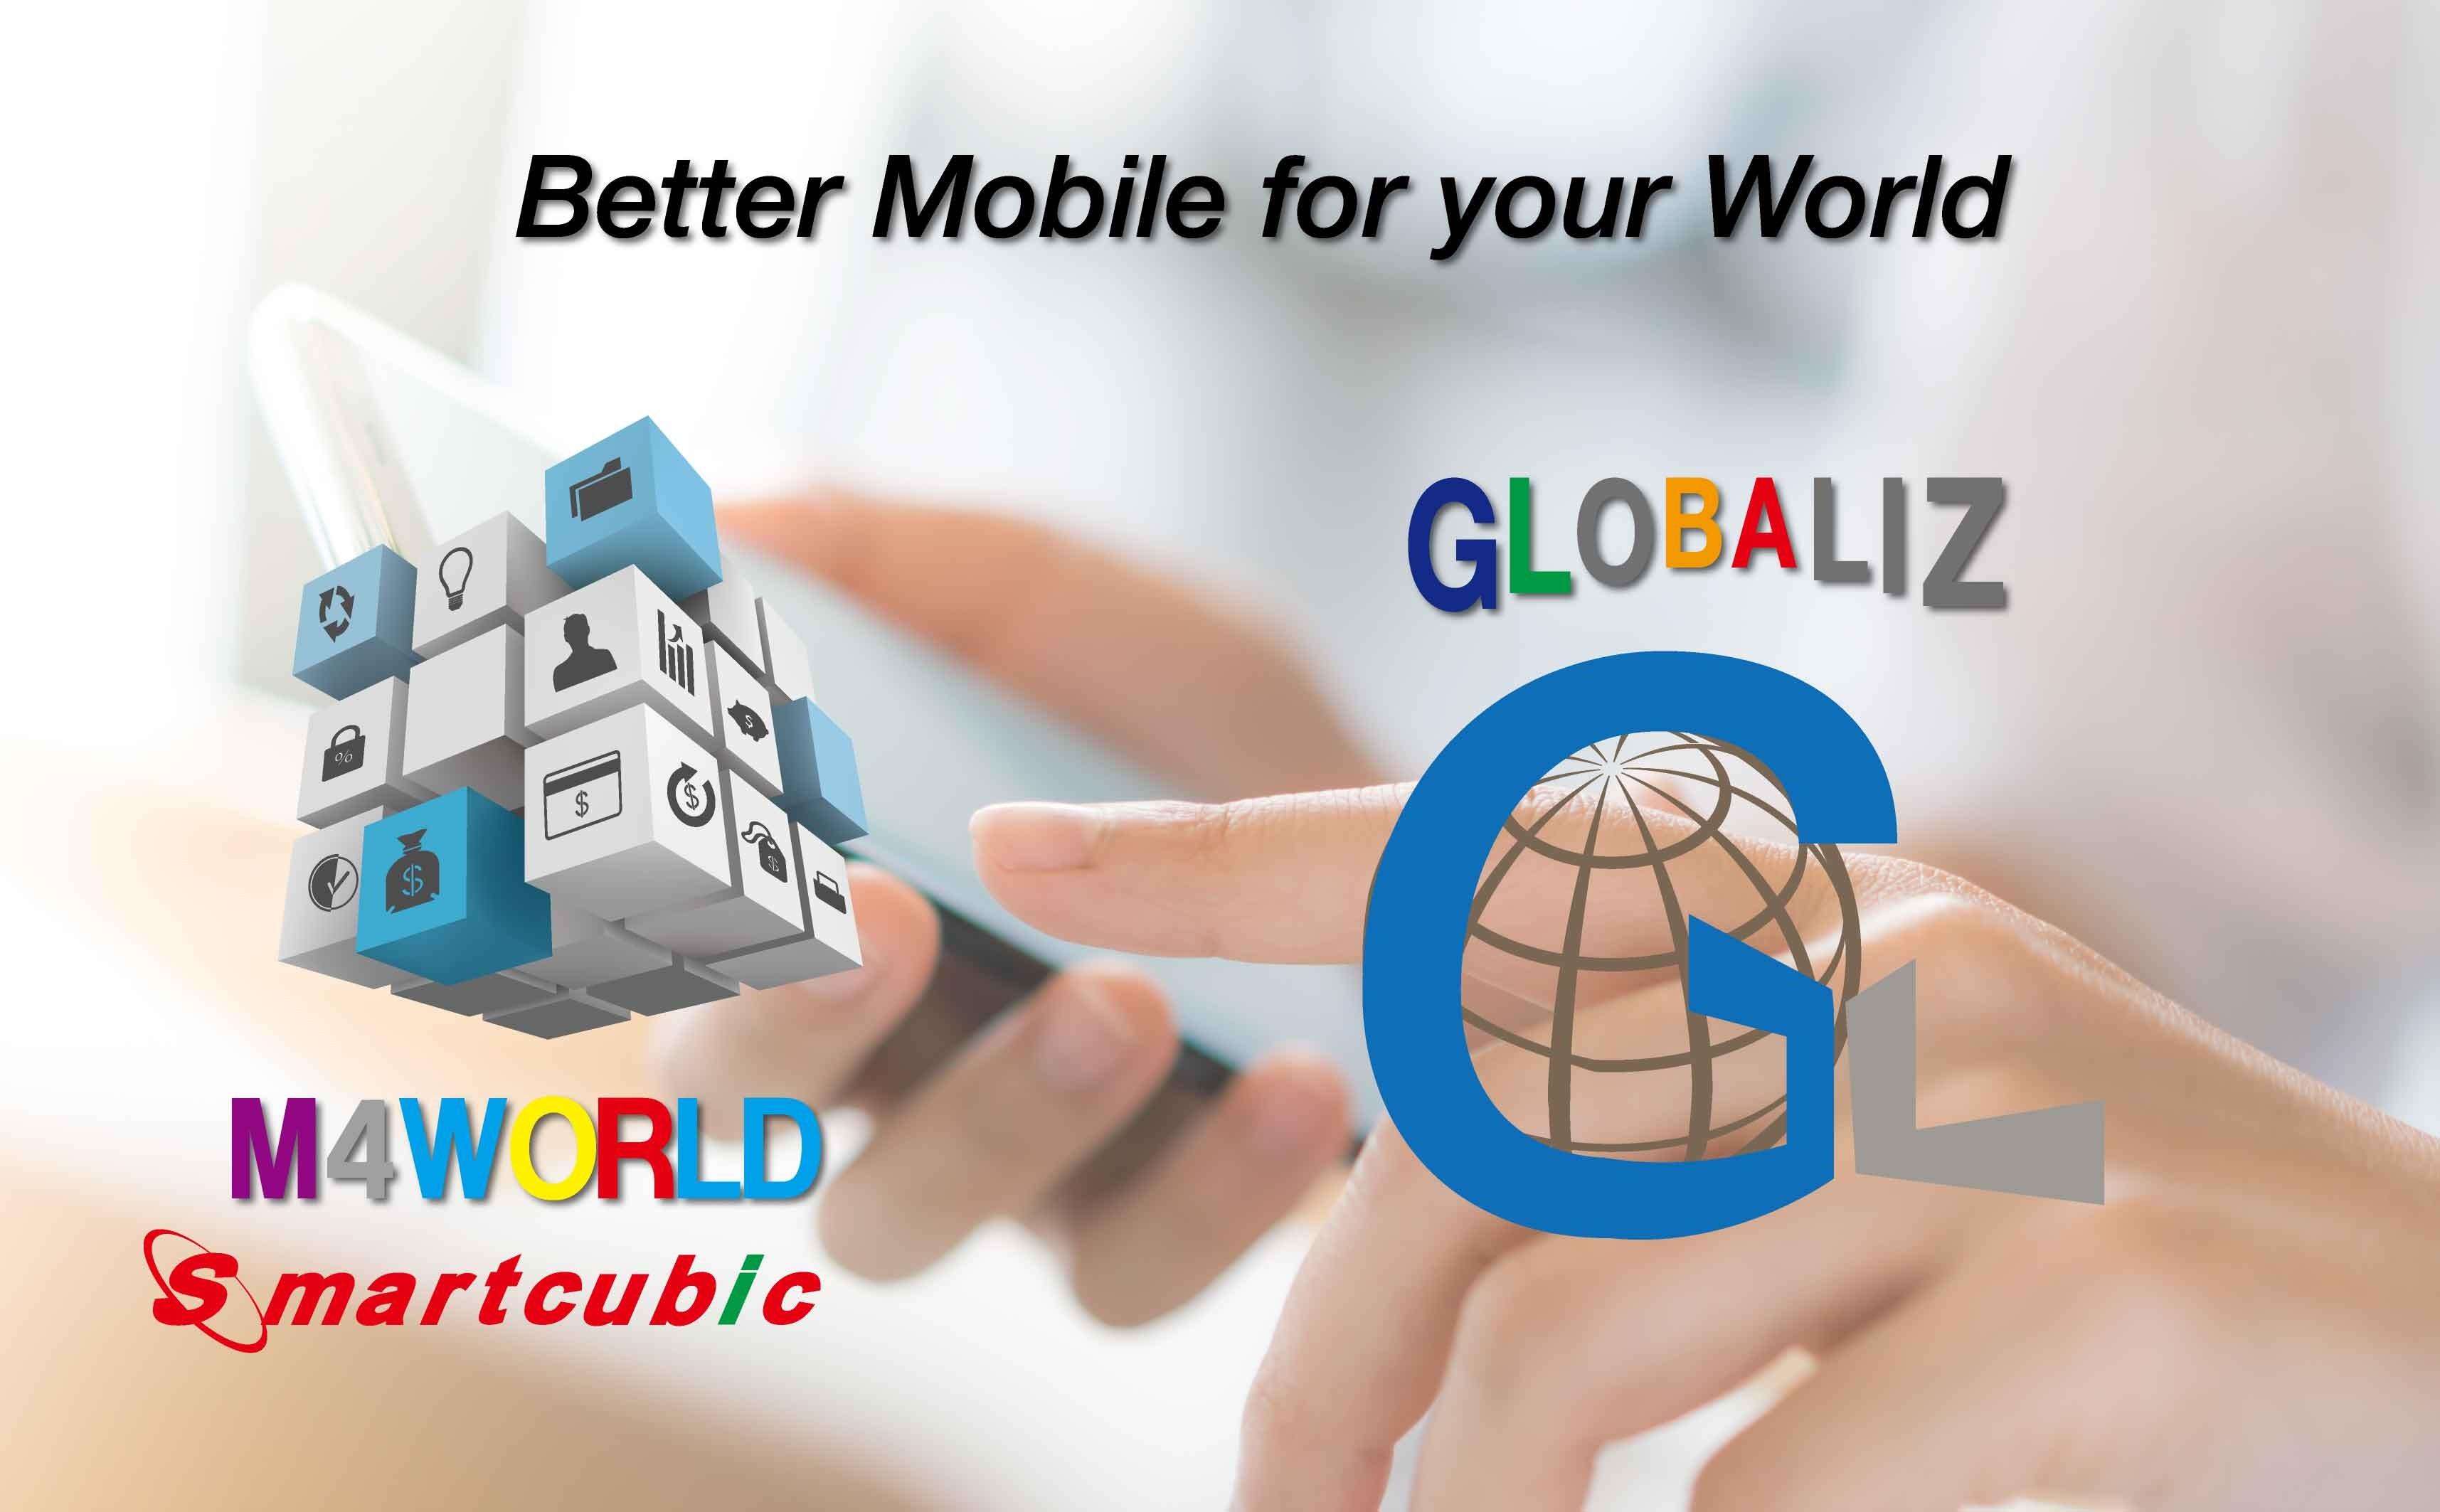 smartcubic platform